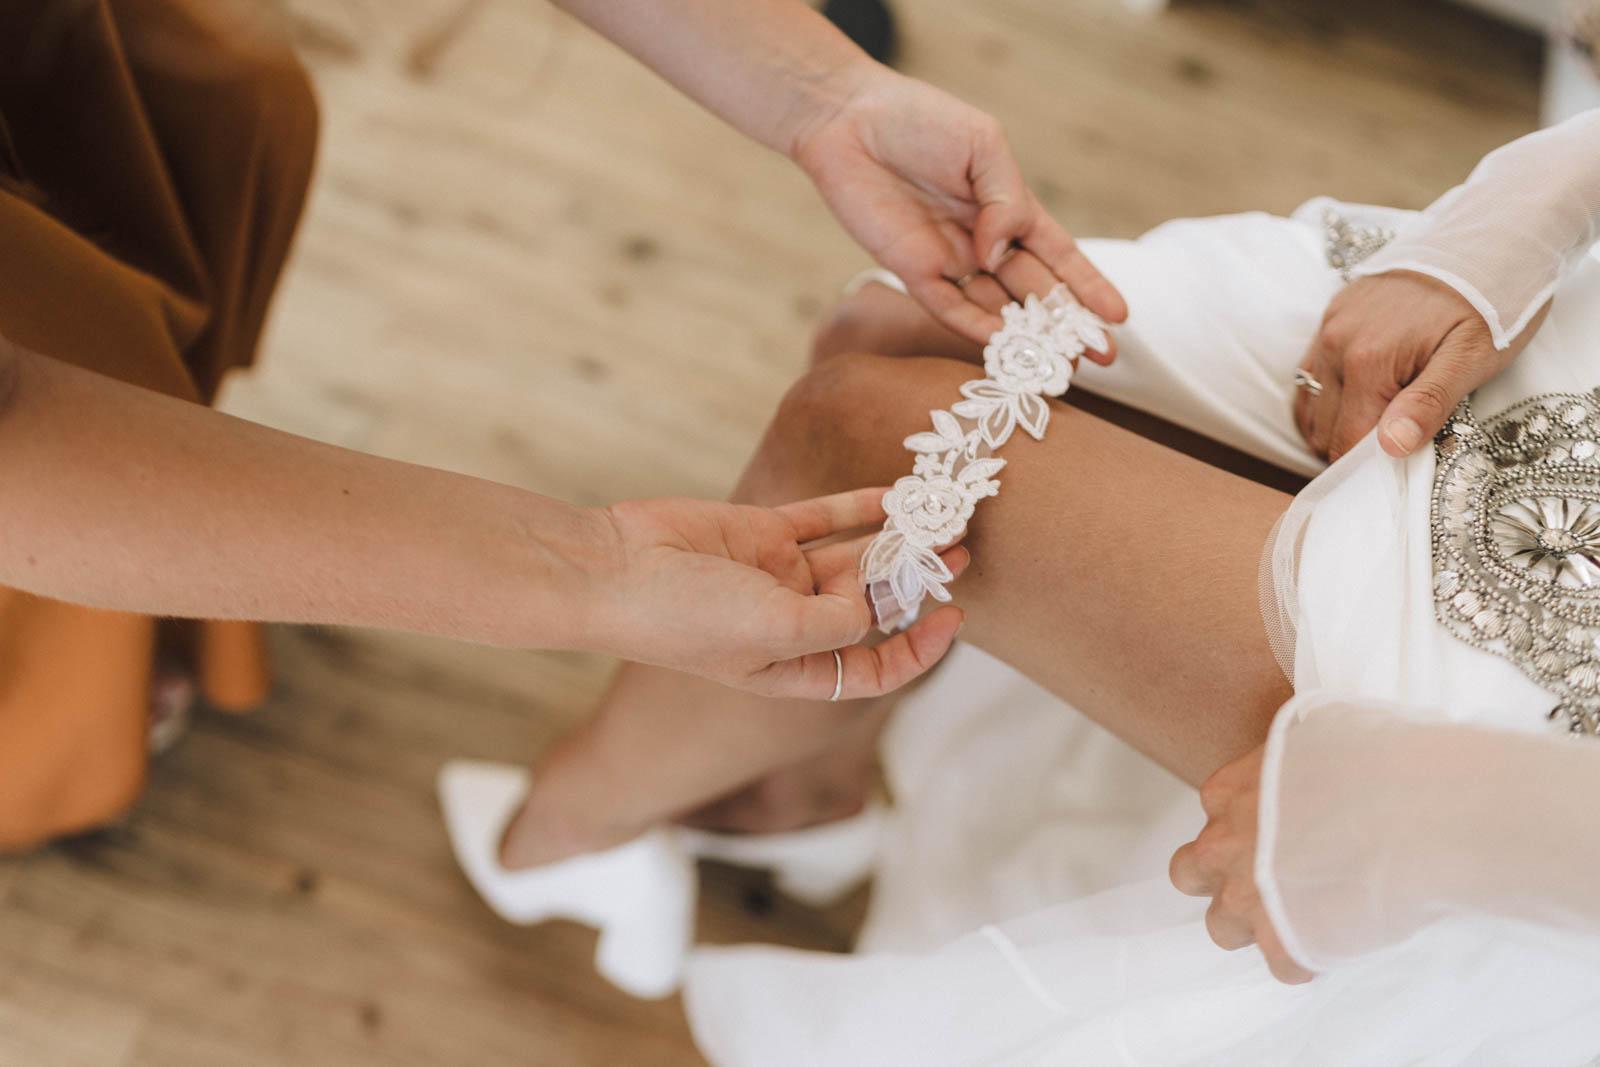 newfound-l-i-coromandel-wedding-photographer-1533-A9_02650